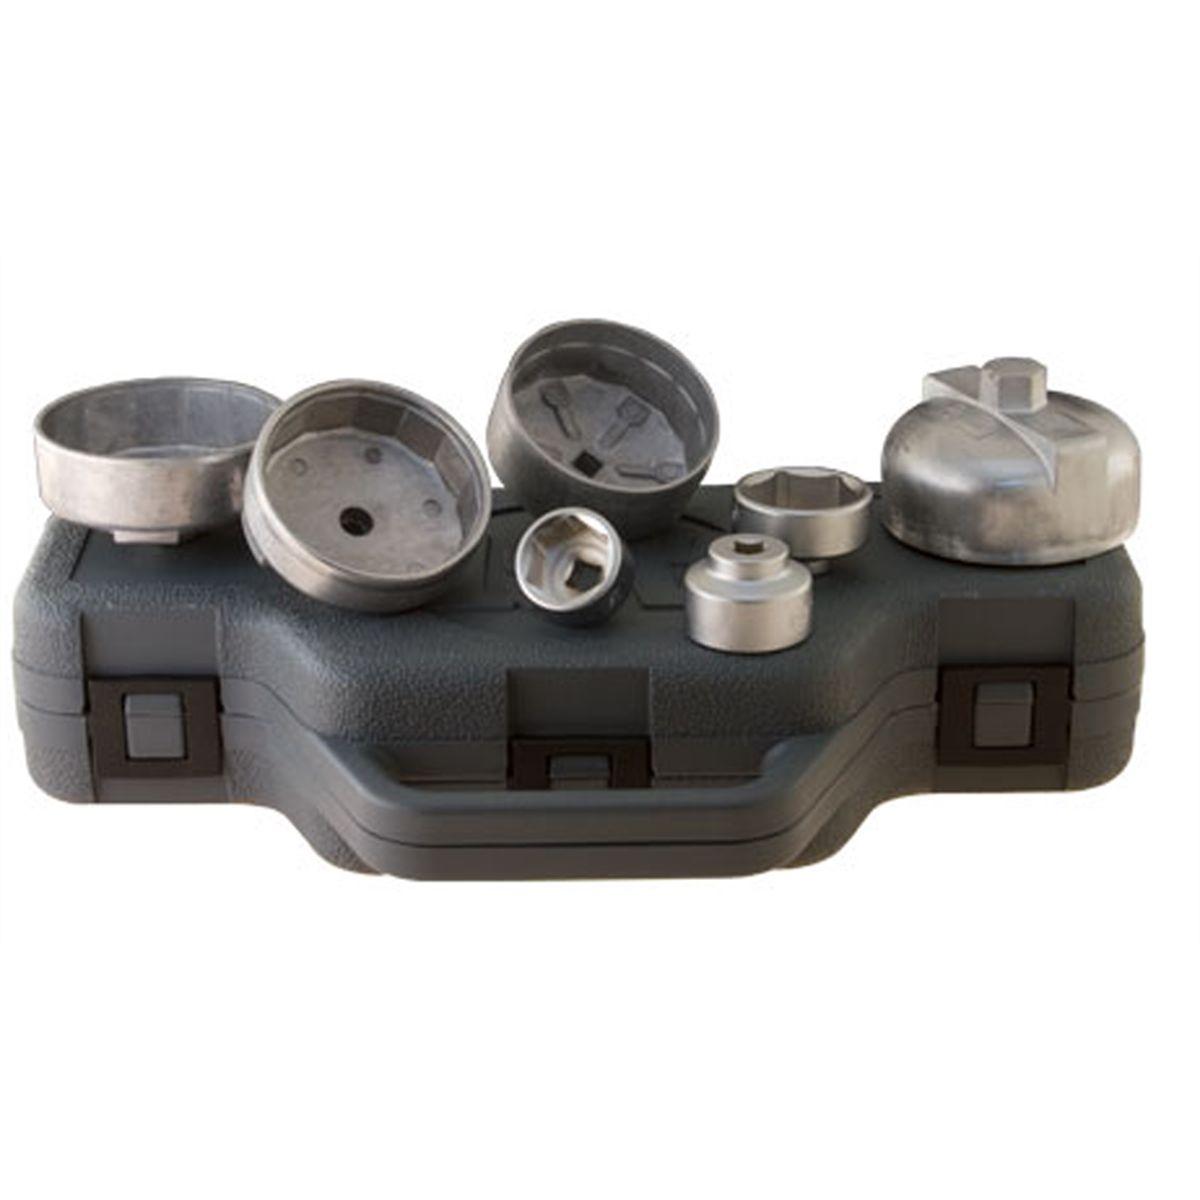 hight resolution of oil filter tool set mercedes vw audi bmw saturn gm